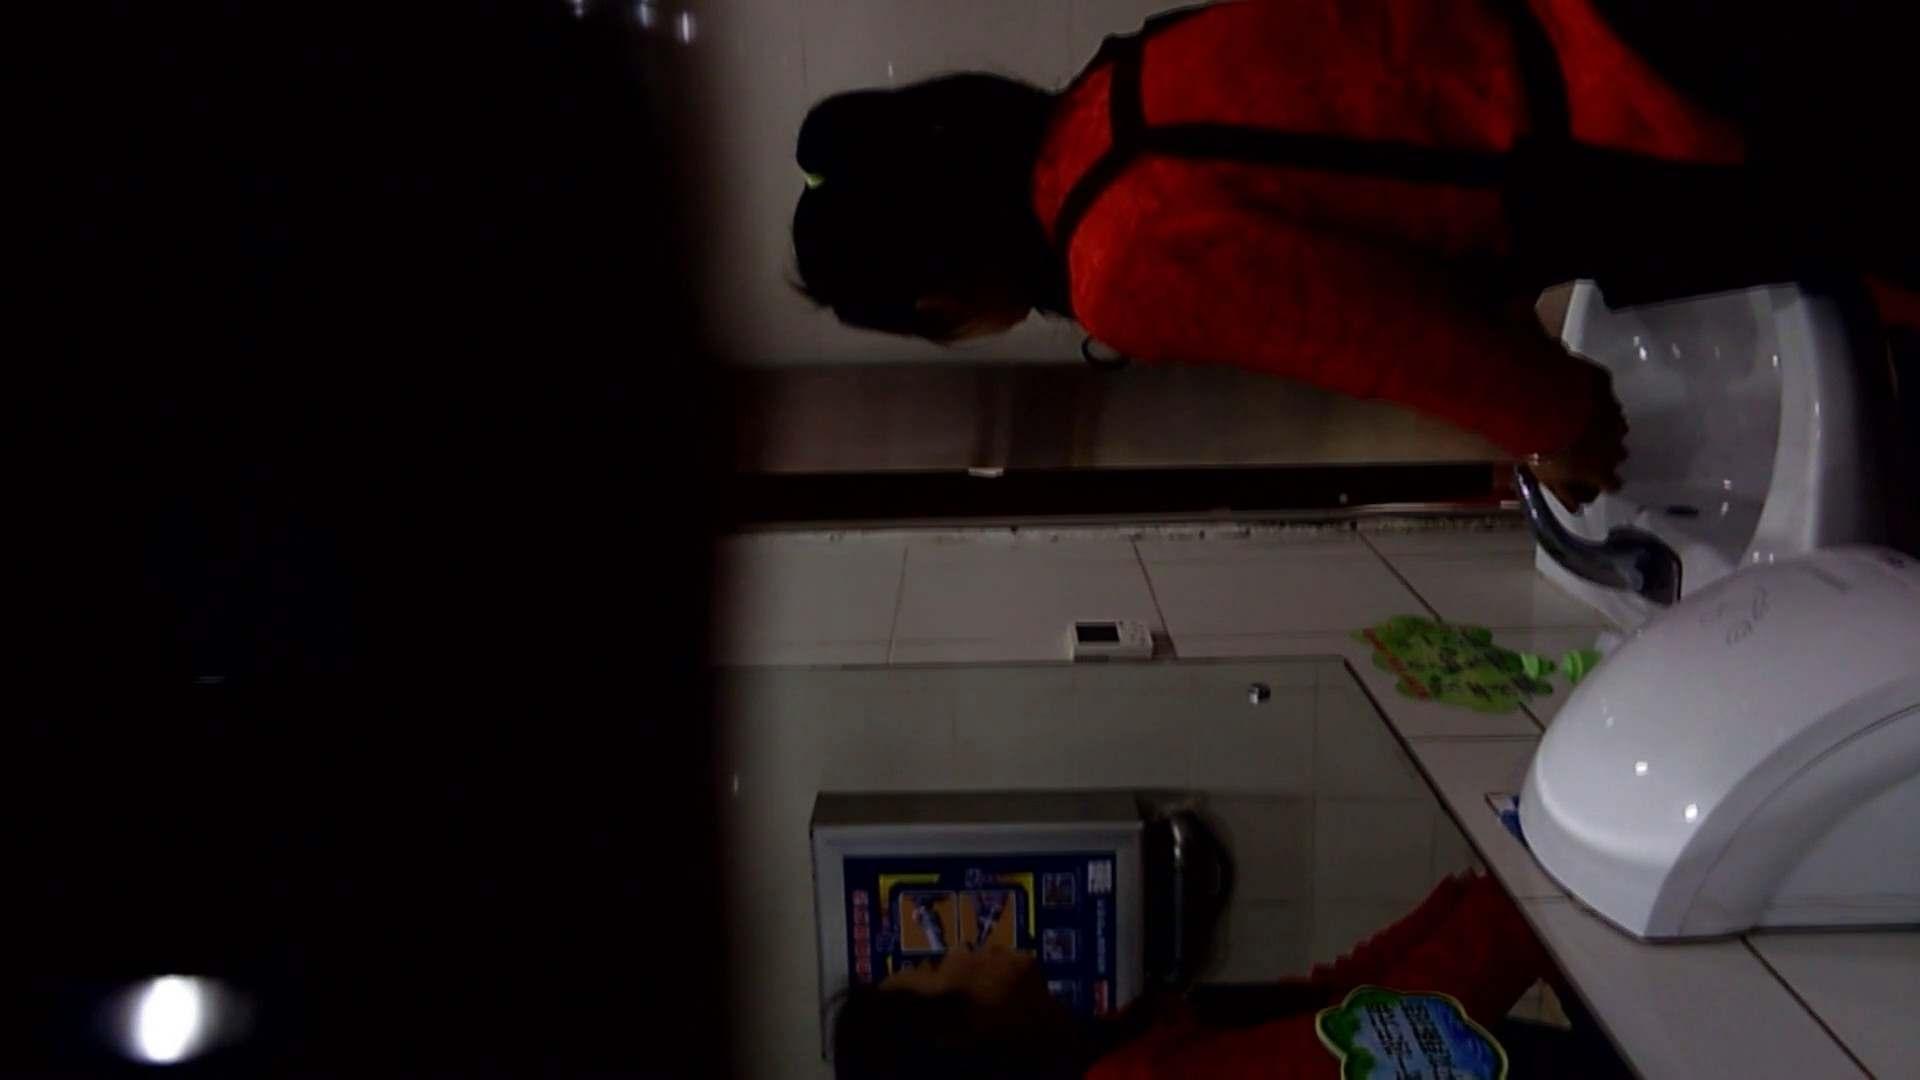 芸術大学ガチ潜入盗撮 JD盗撮 美女の洗面所の秘密 Vol.105 高評価 エロ画像 68画像 57